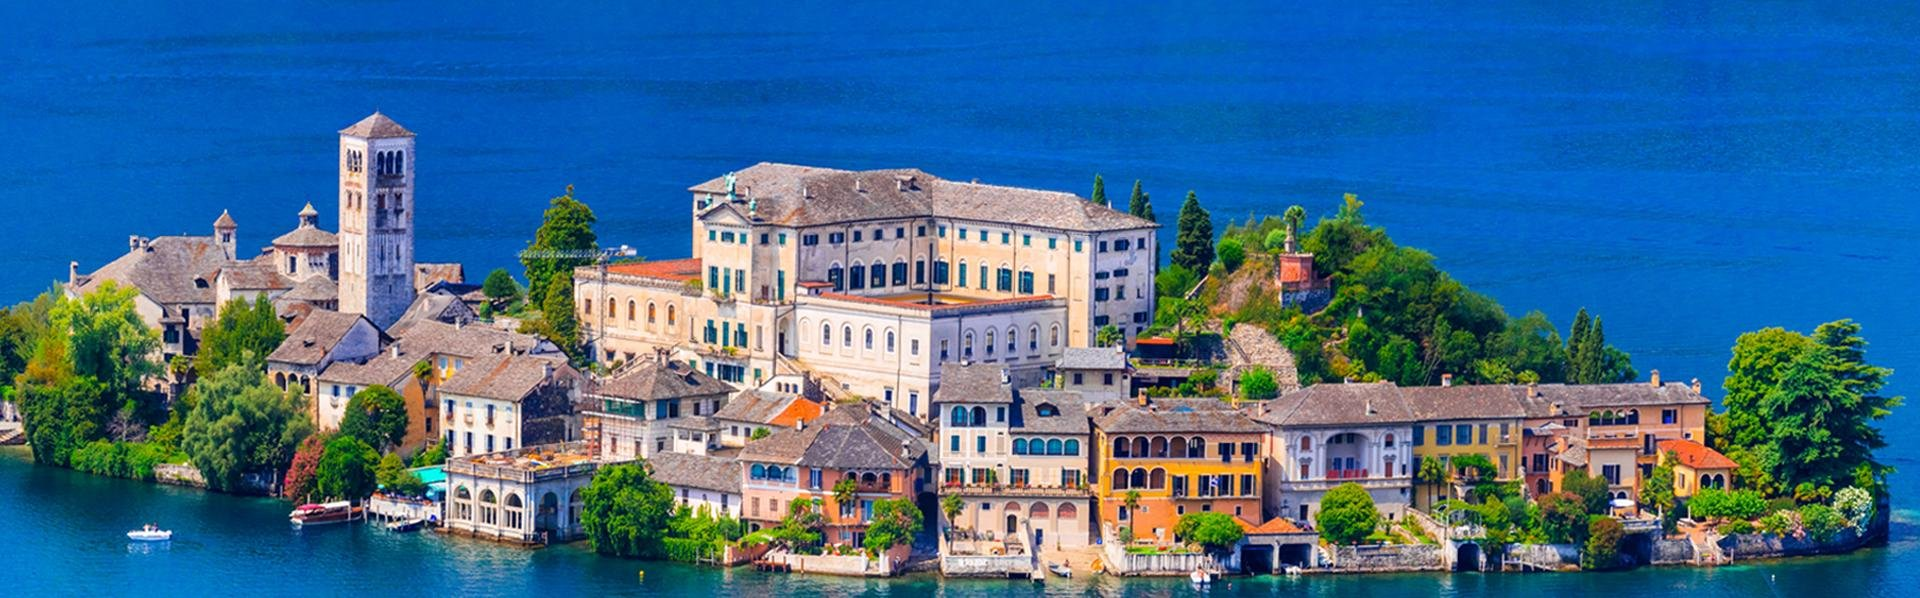 Orta San Giulio, Italië